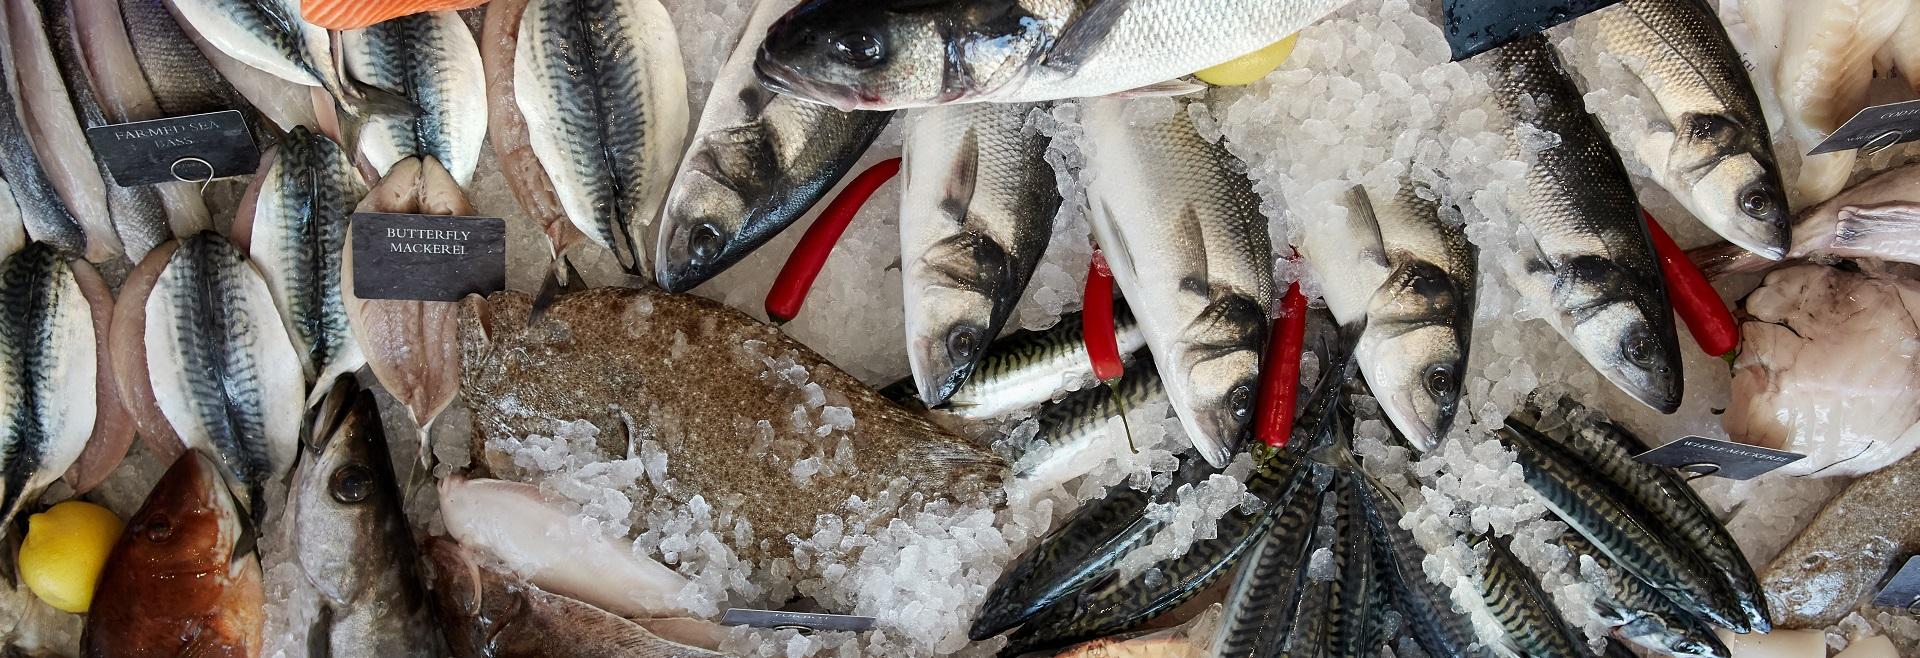 Steins-Online-Fishmongers